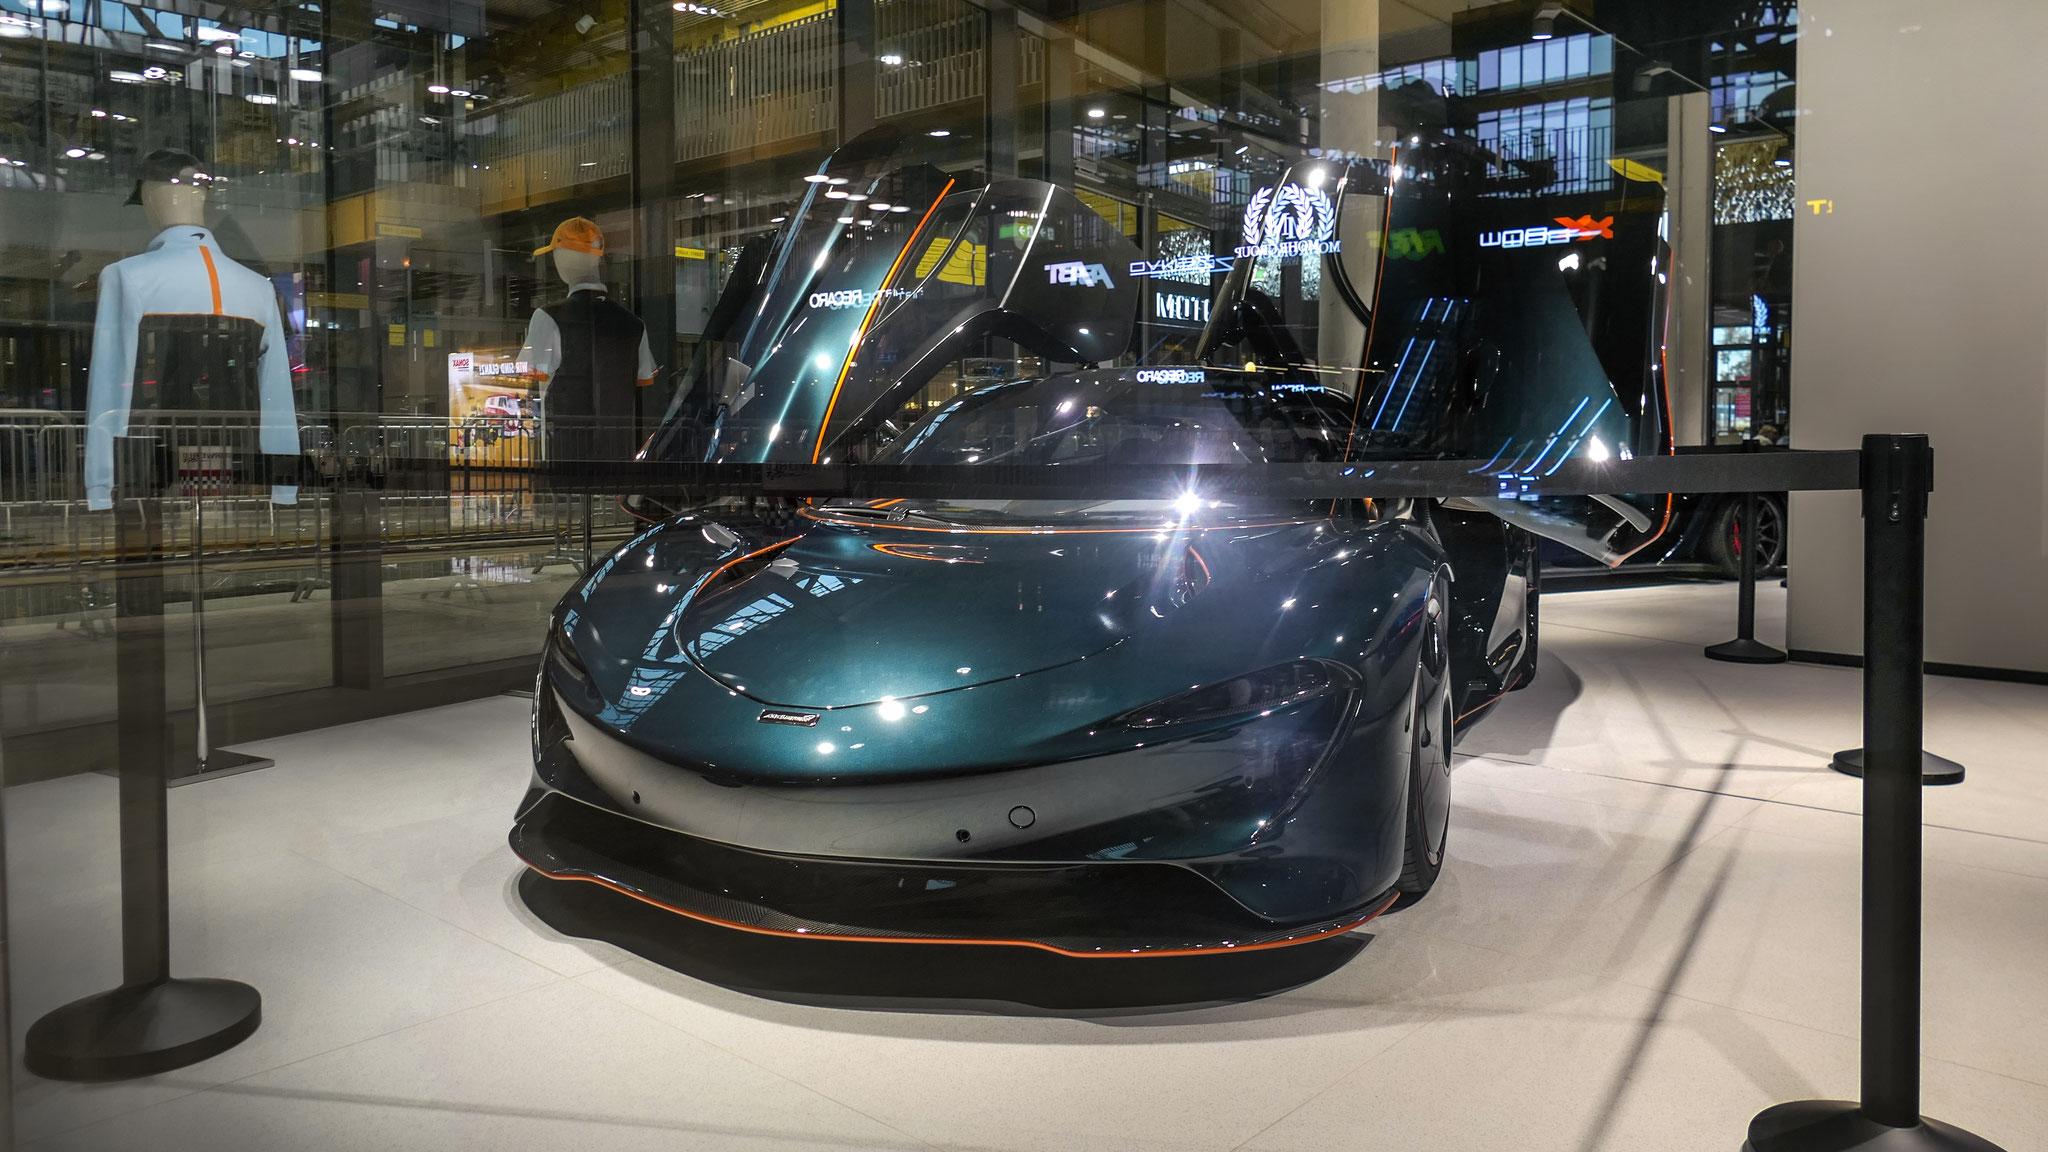 McLaren Speedtail - D-HH-403